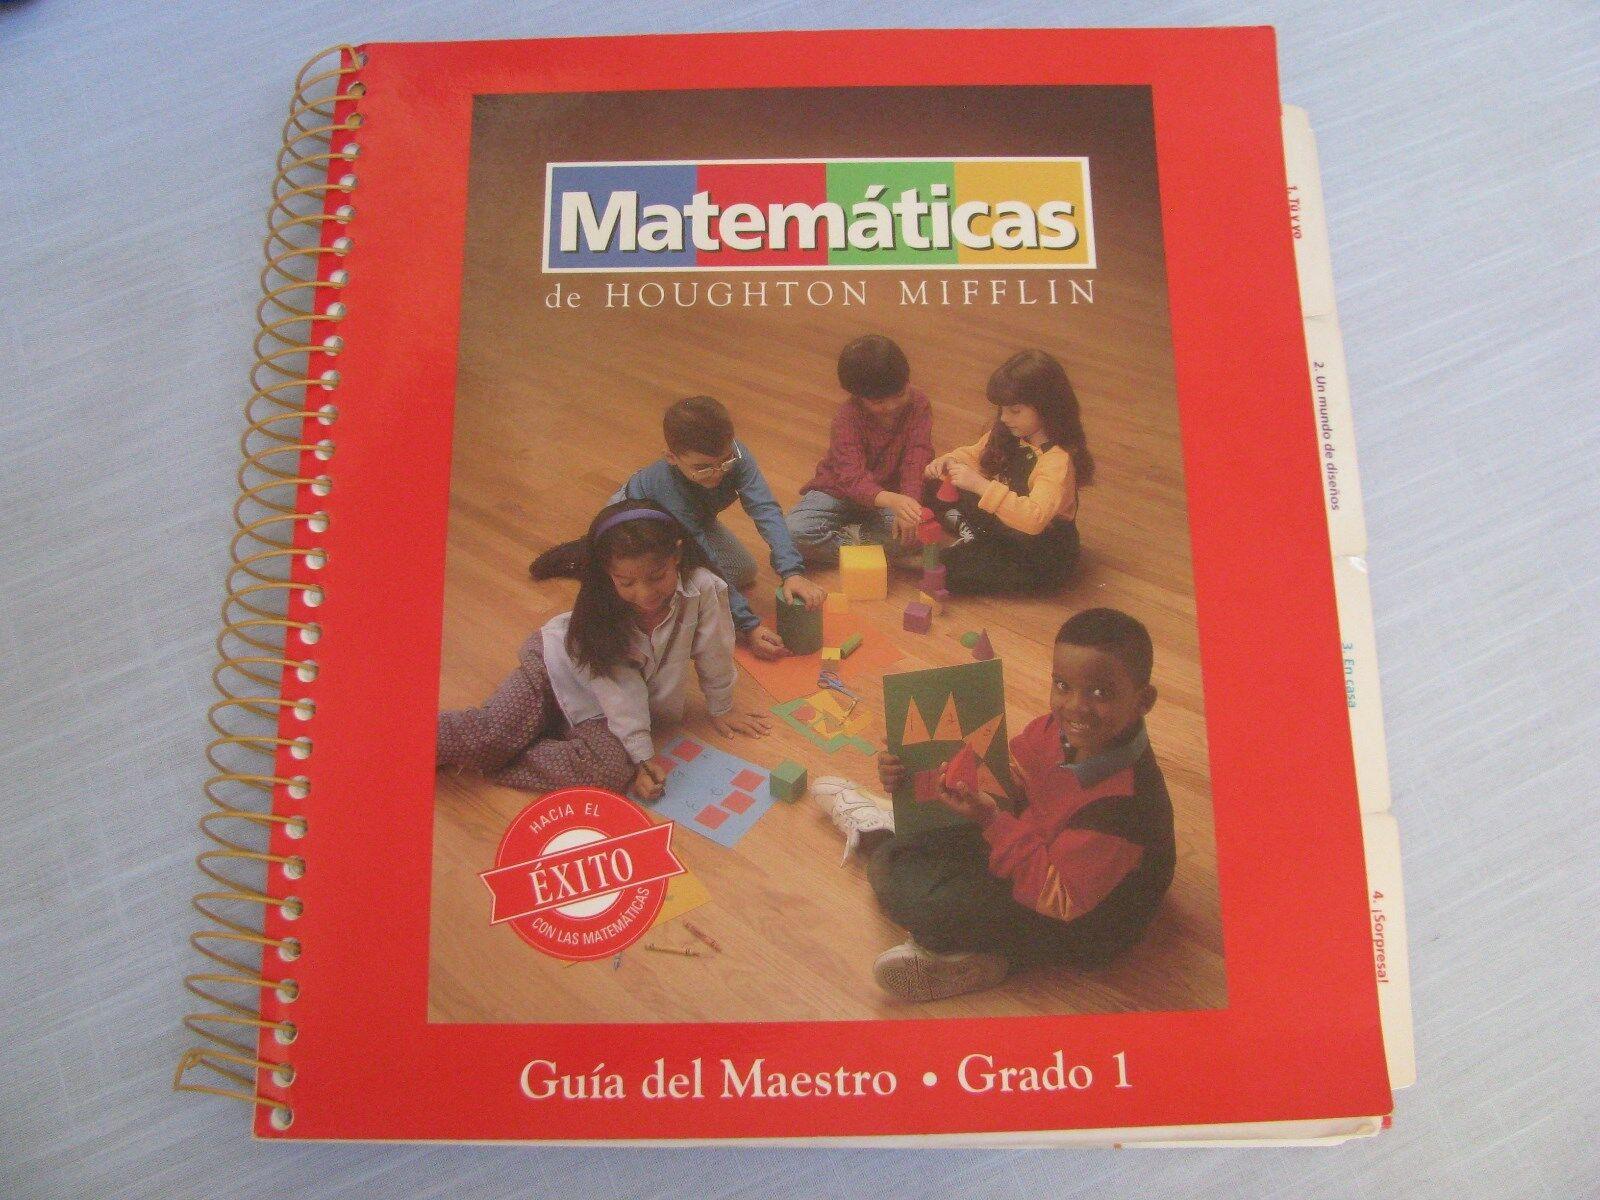 Houghton Mifflin Matematicas GIA Del Maestro Grado 1 Spanish Math ...